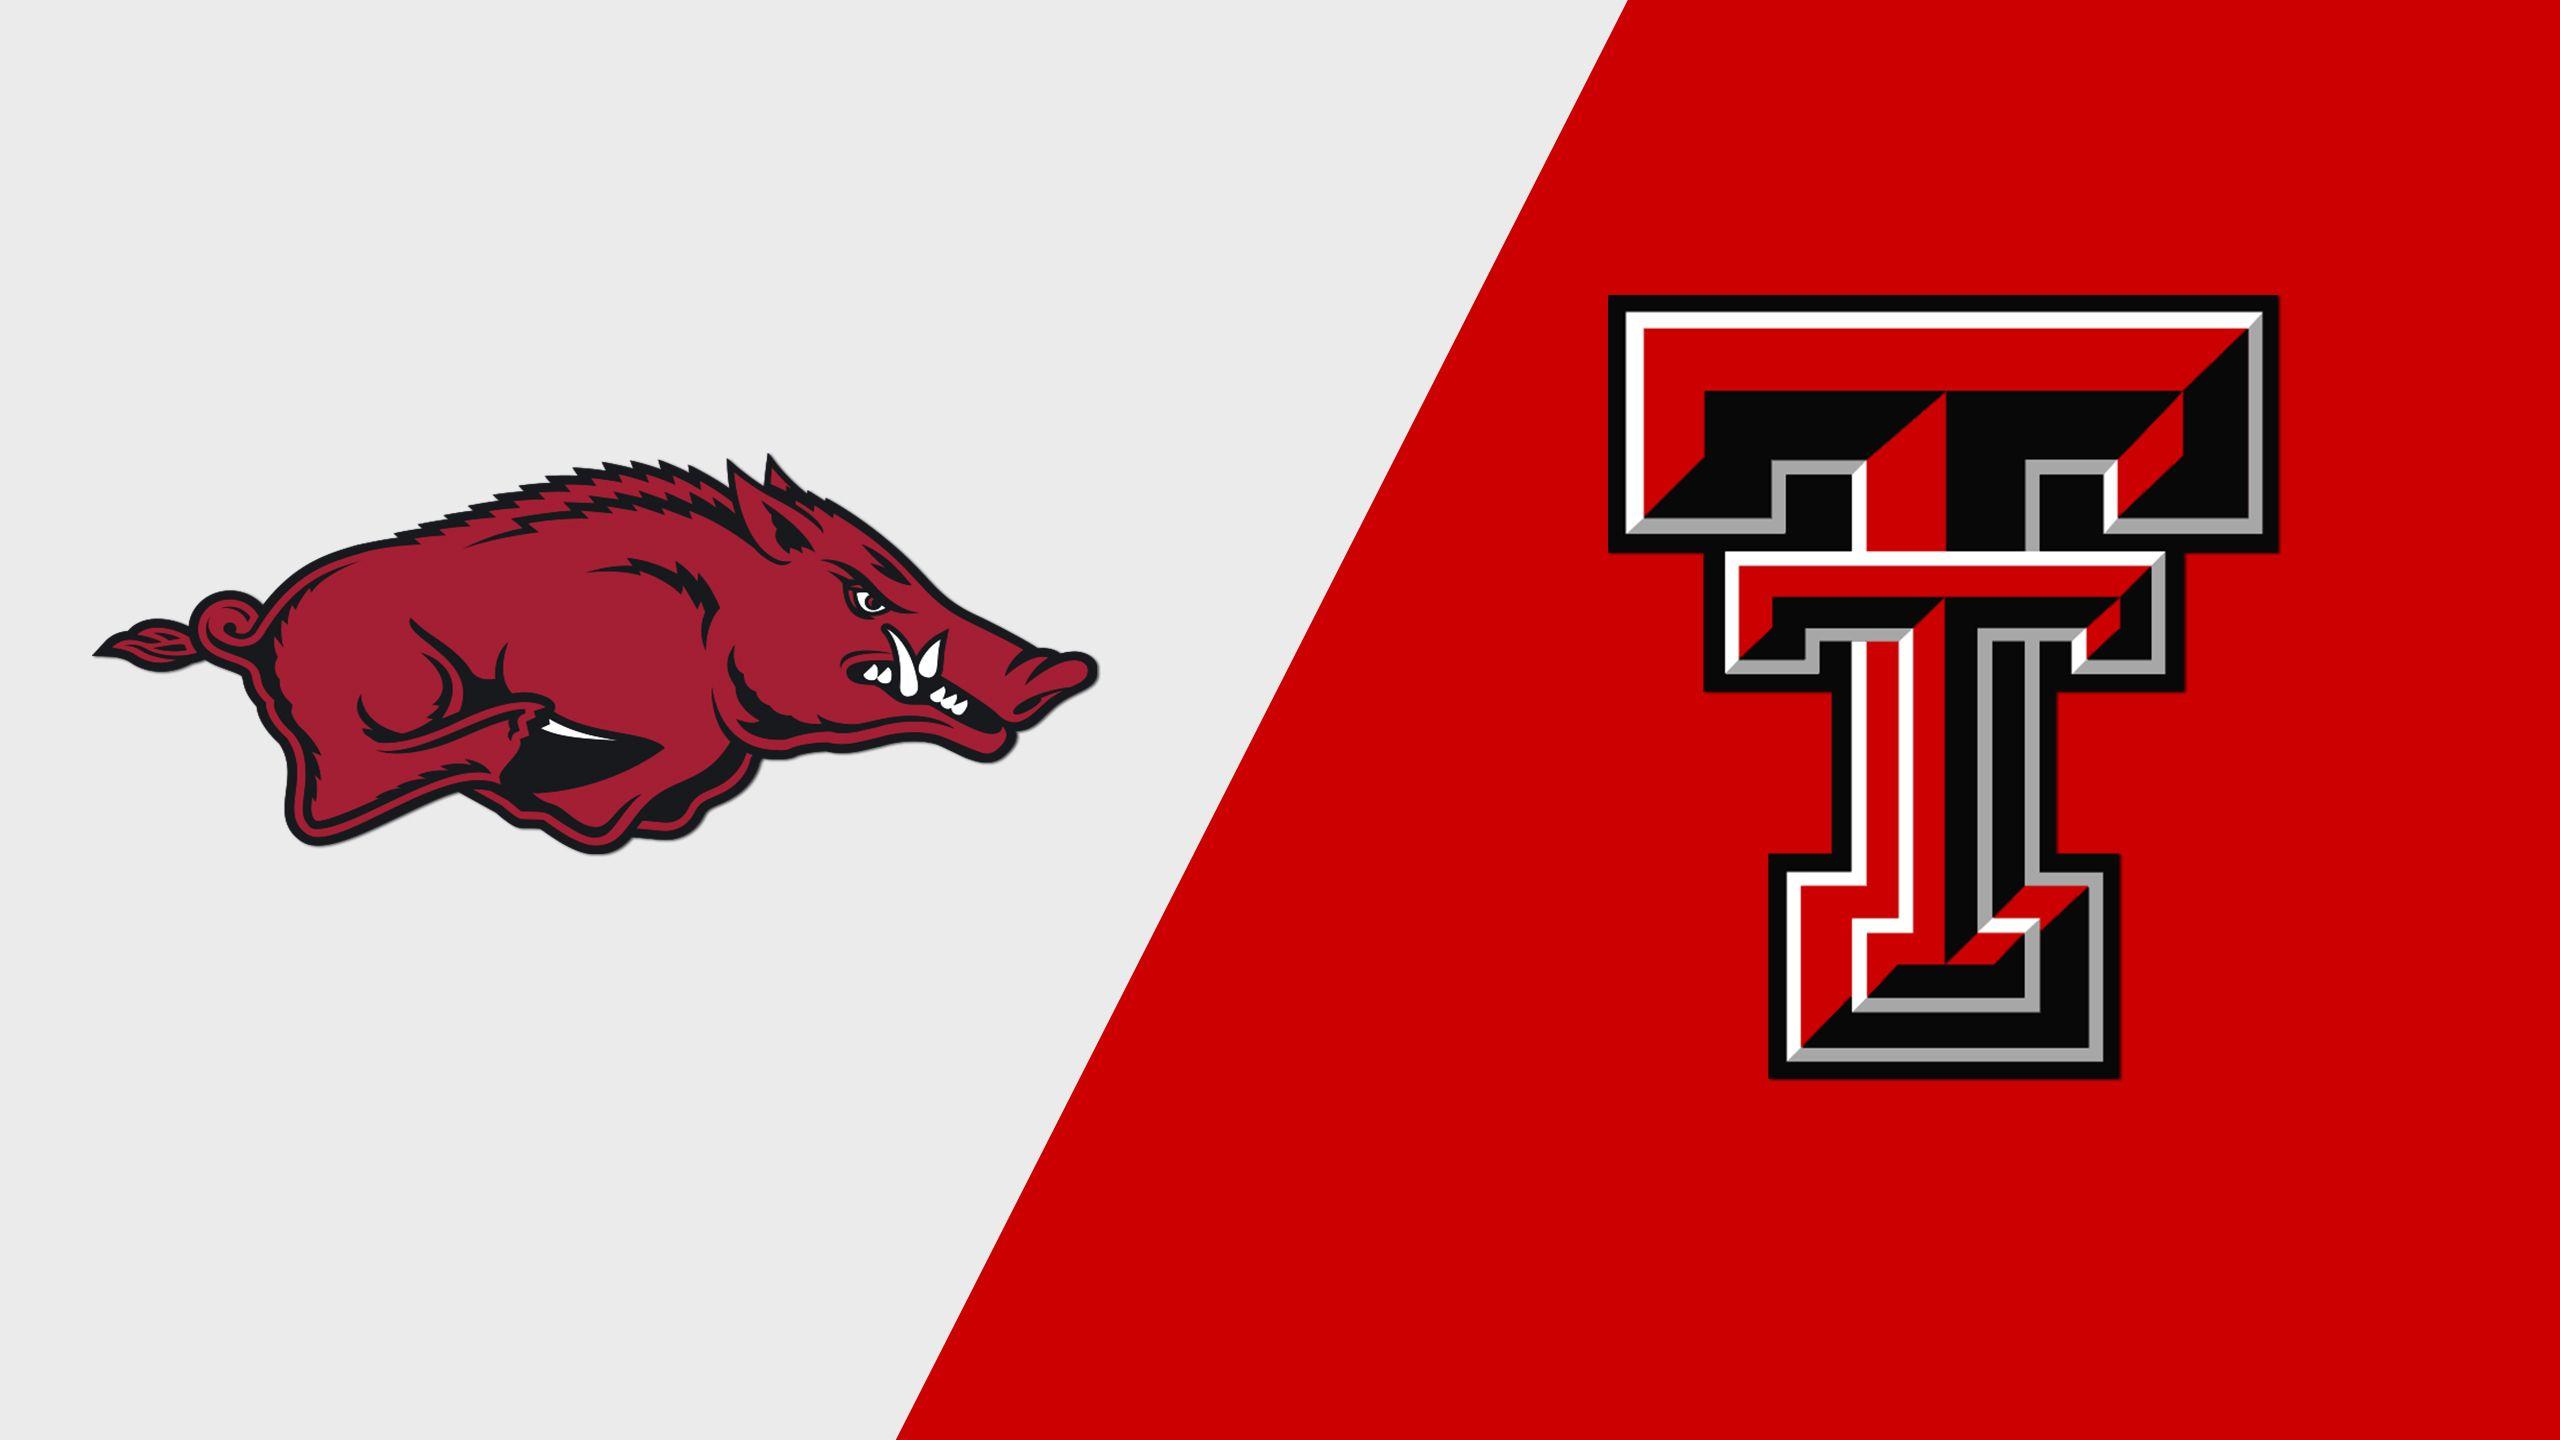 Ump Cam - #5 Arkansas vs. #9 Texas Tech (Game 8) (College World Series)